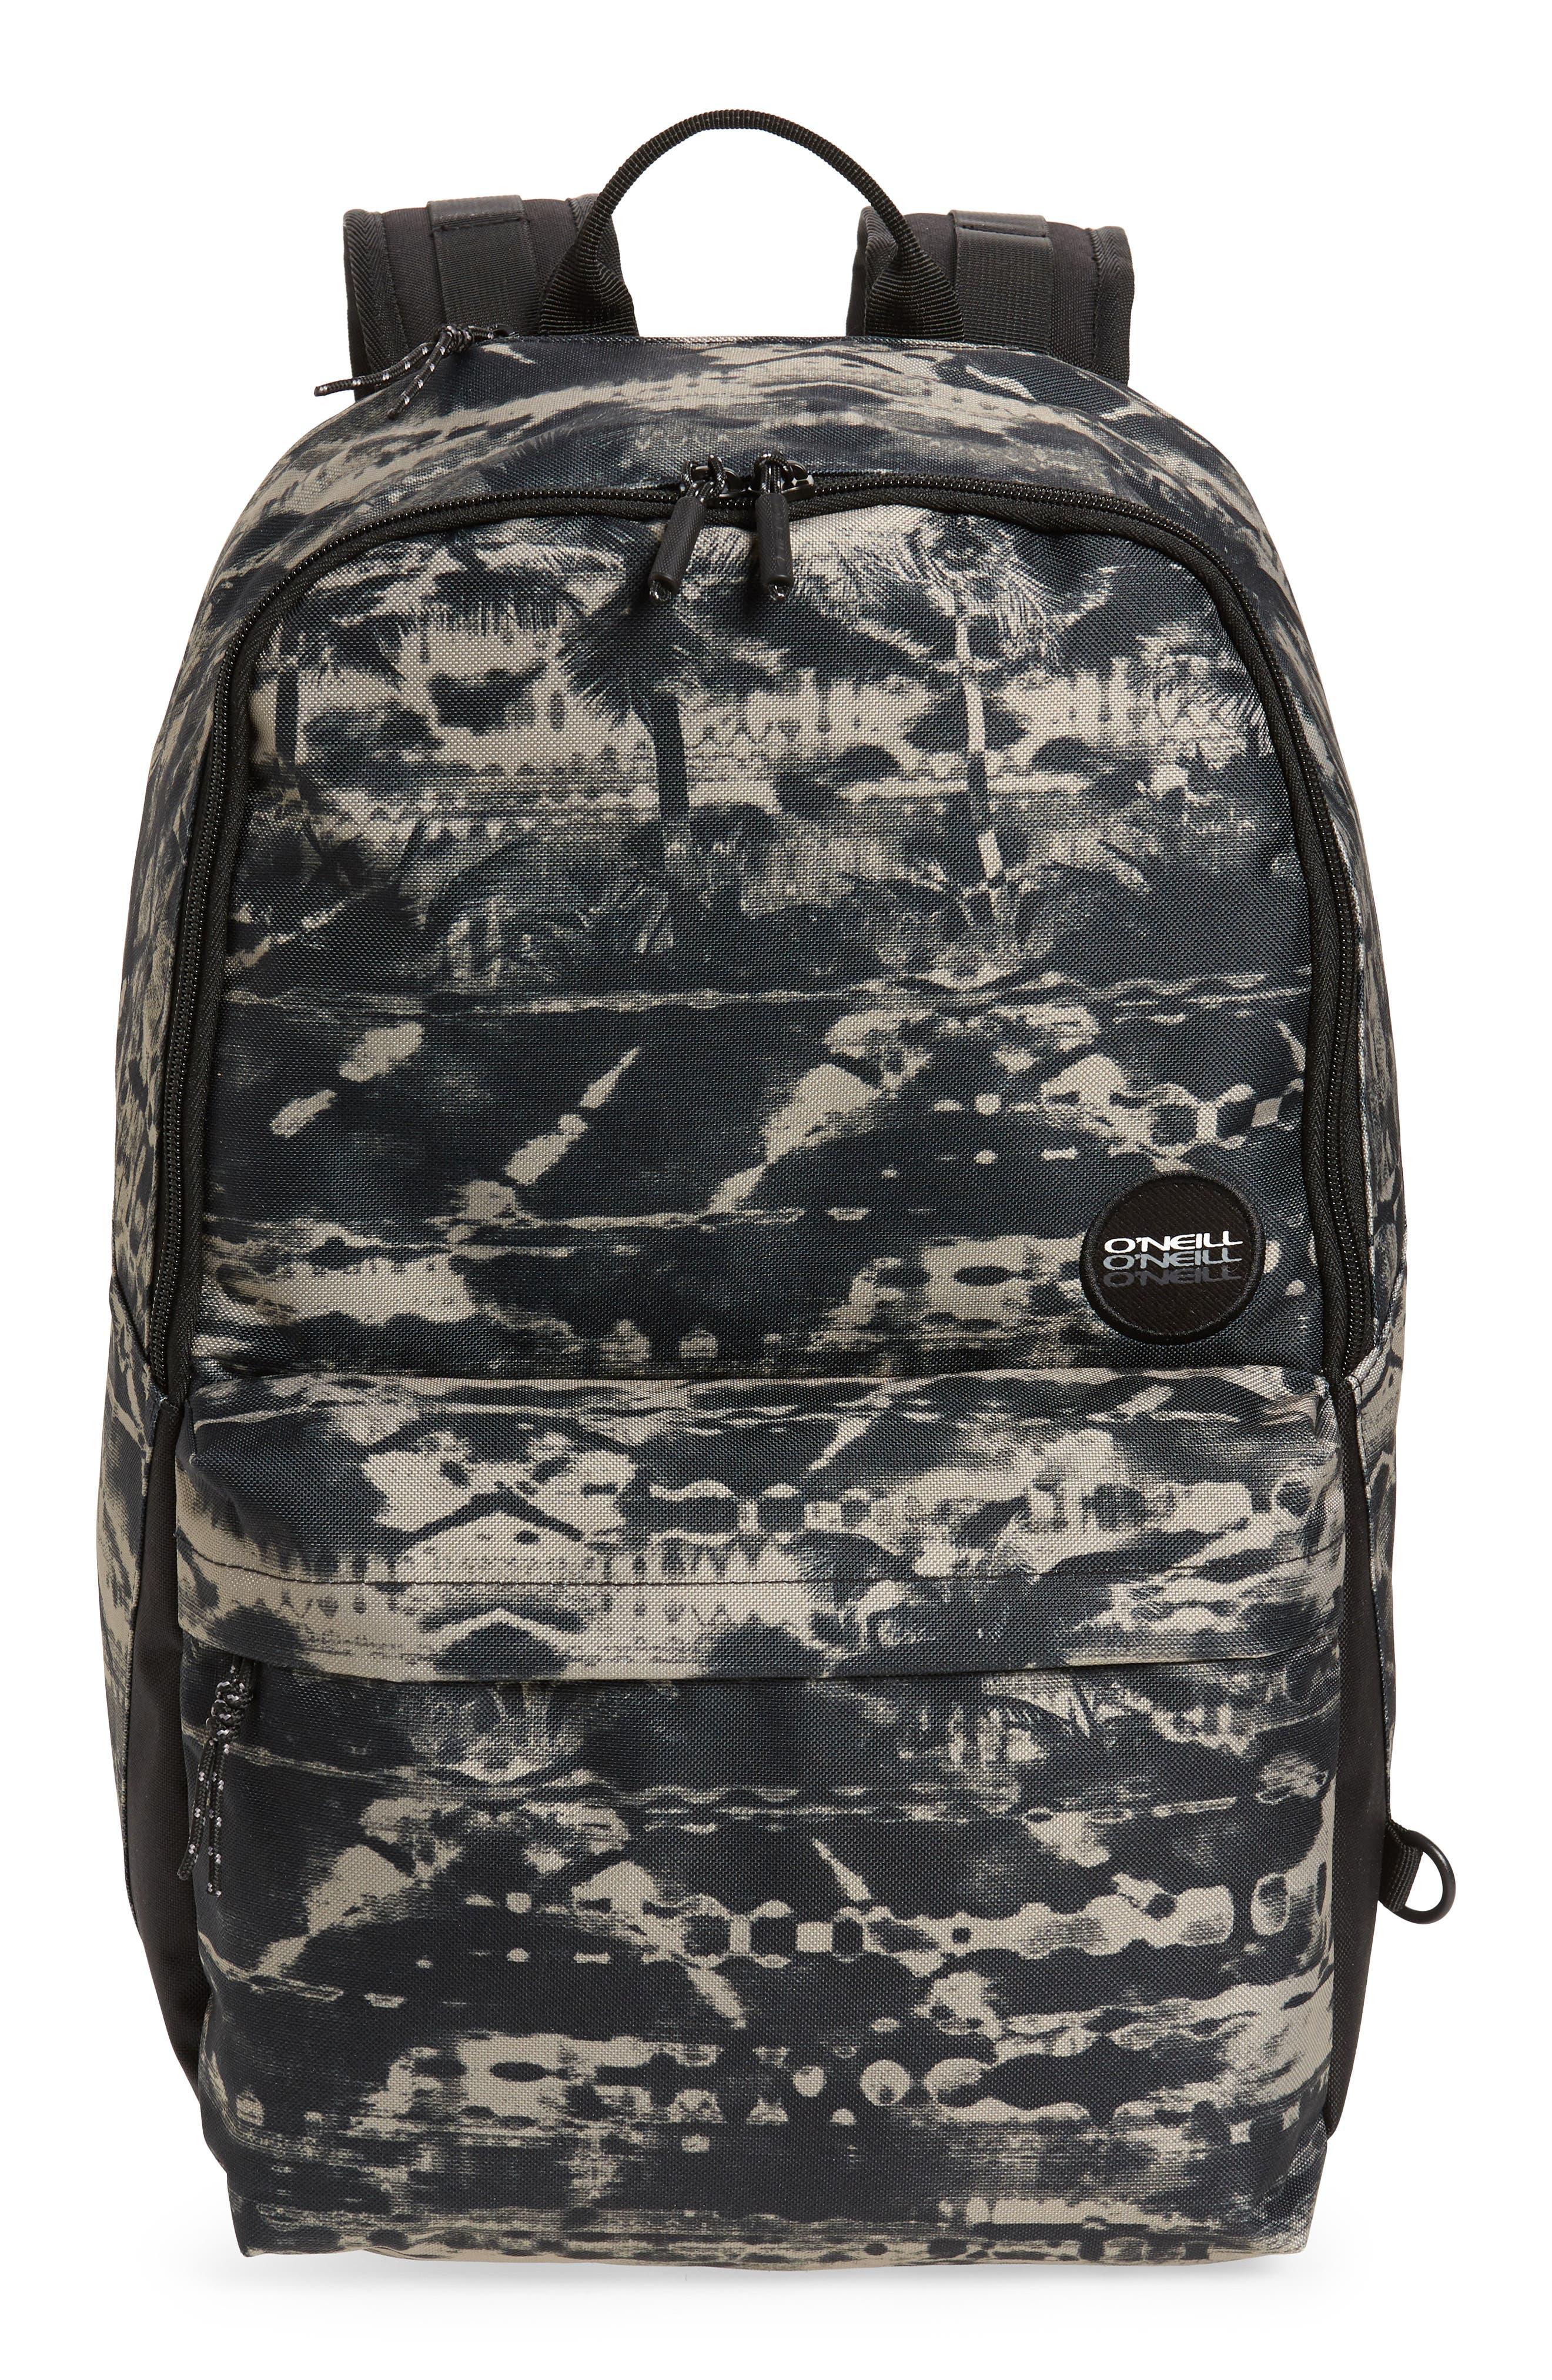 Transfer Backpack,                             Main thumbnail 1, color,                             DARK ARMY